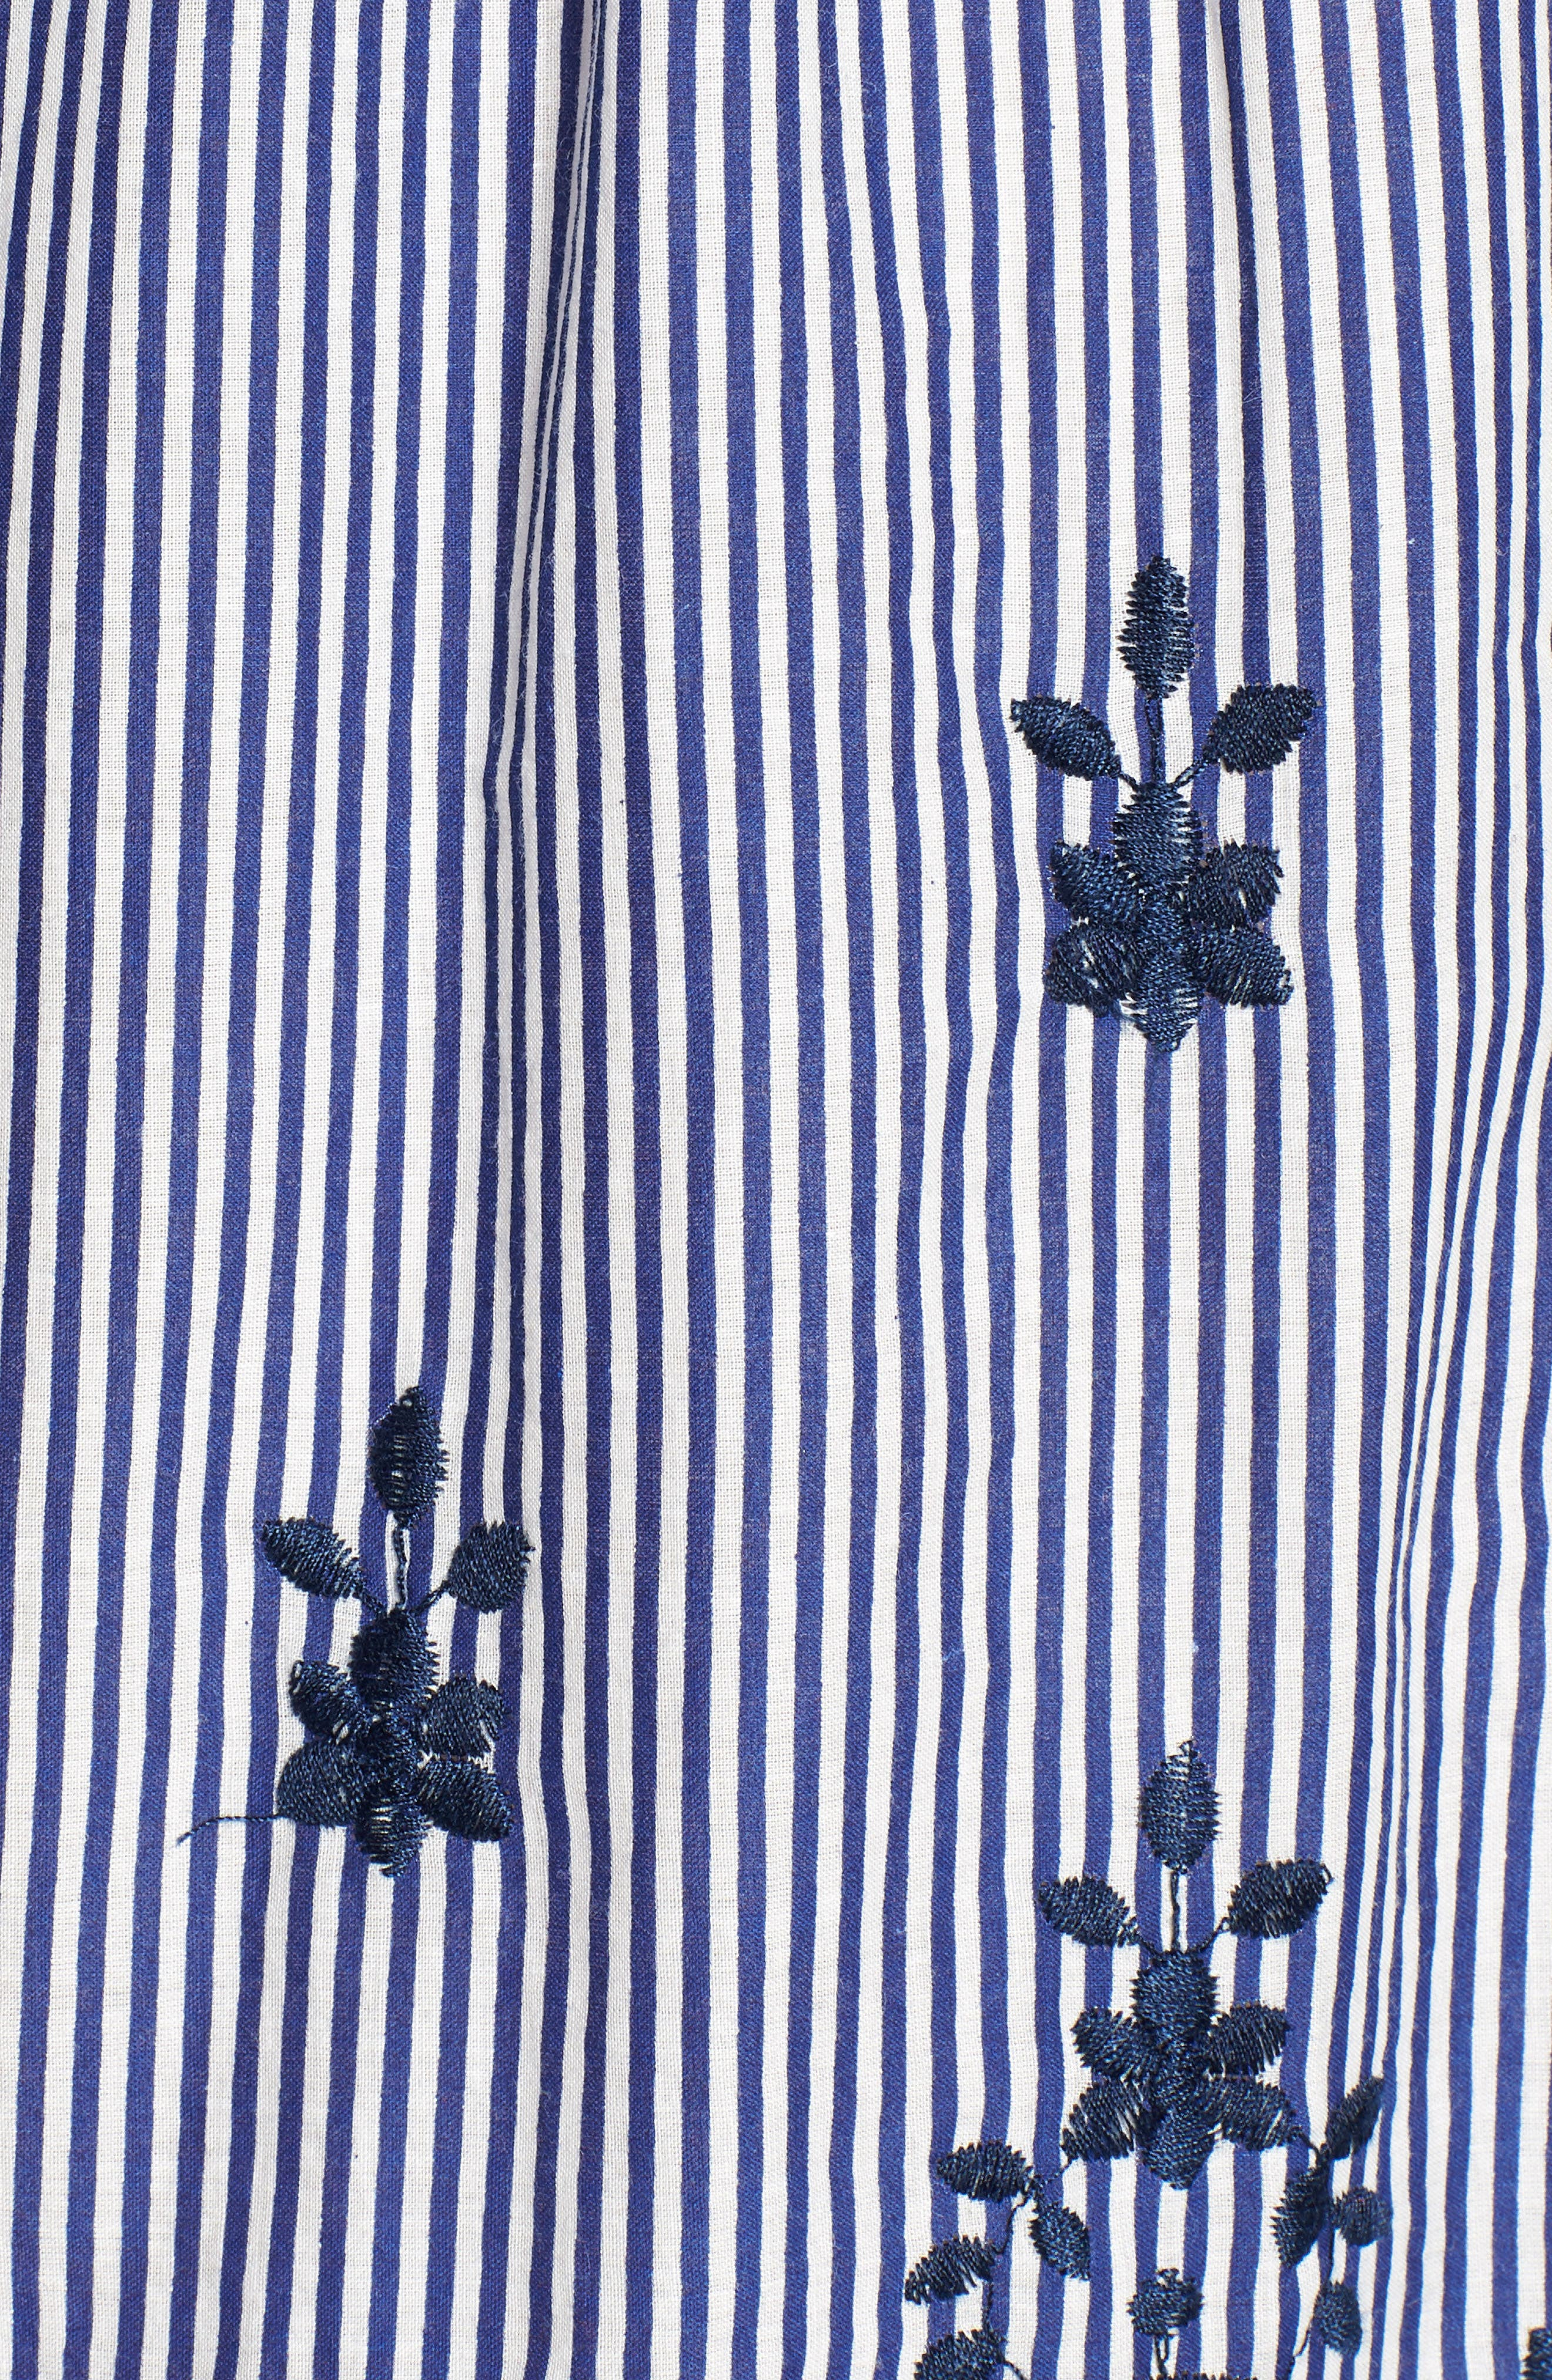 Bishop + Young Stripe Embroidered Off the Shoulder Dress,                             Alternate thumbnail 6, color,